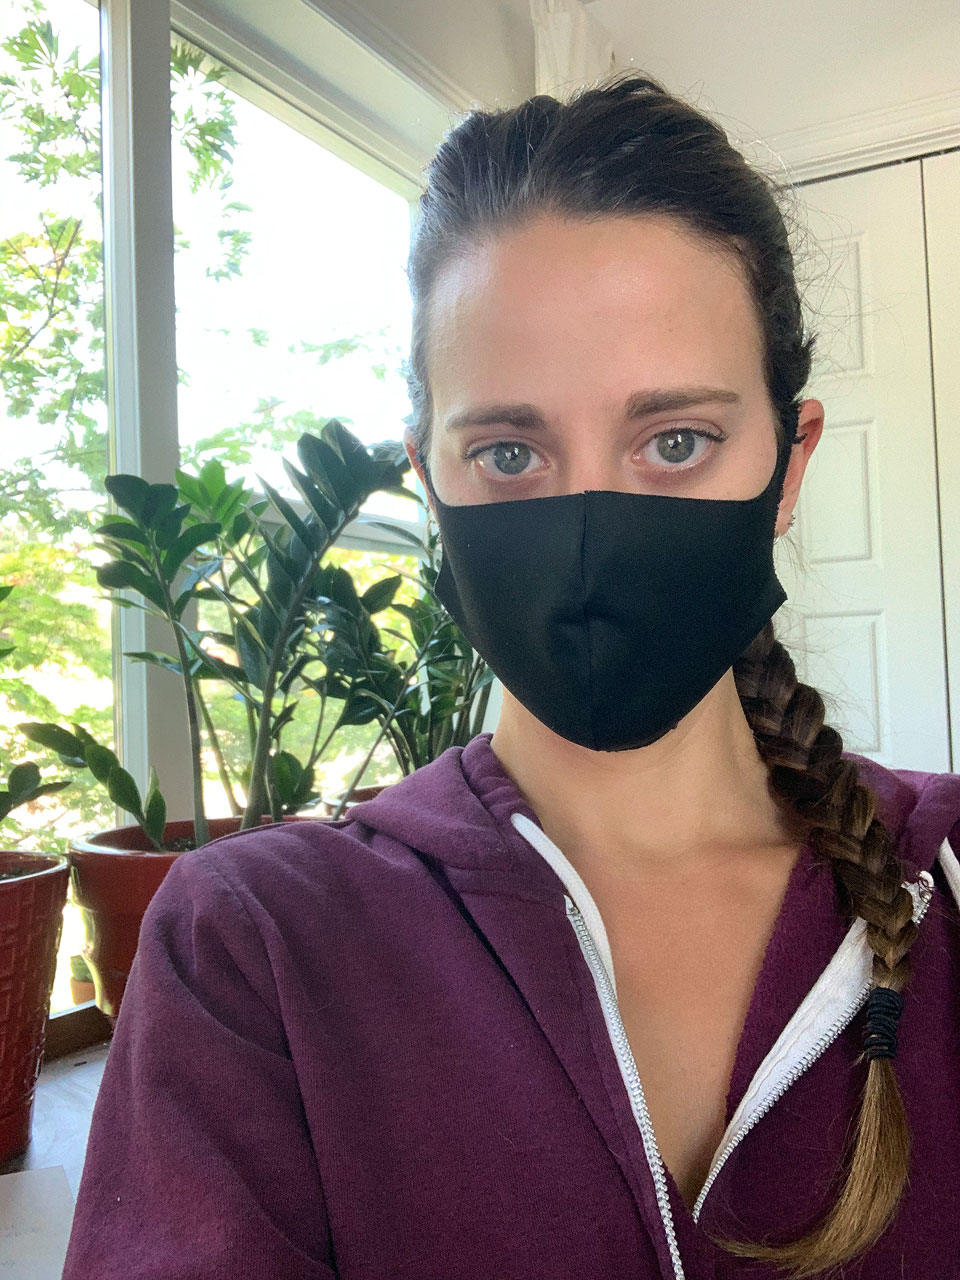 Emily Ryberg shares a mask selfie